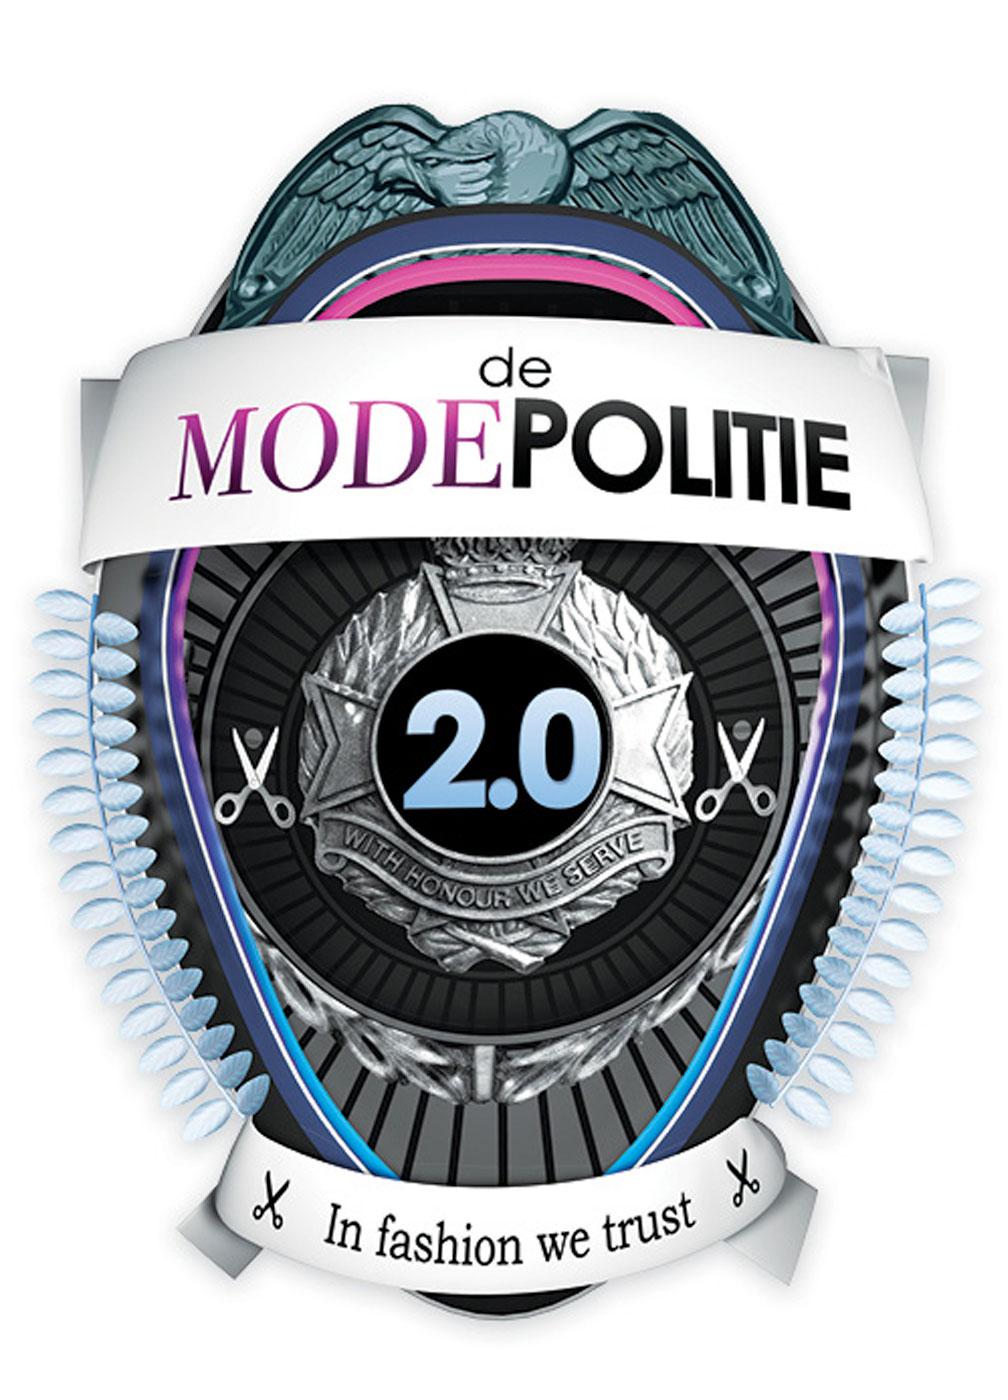 Modepolitie